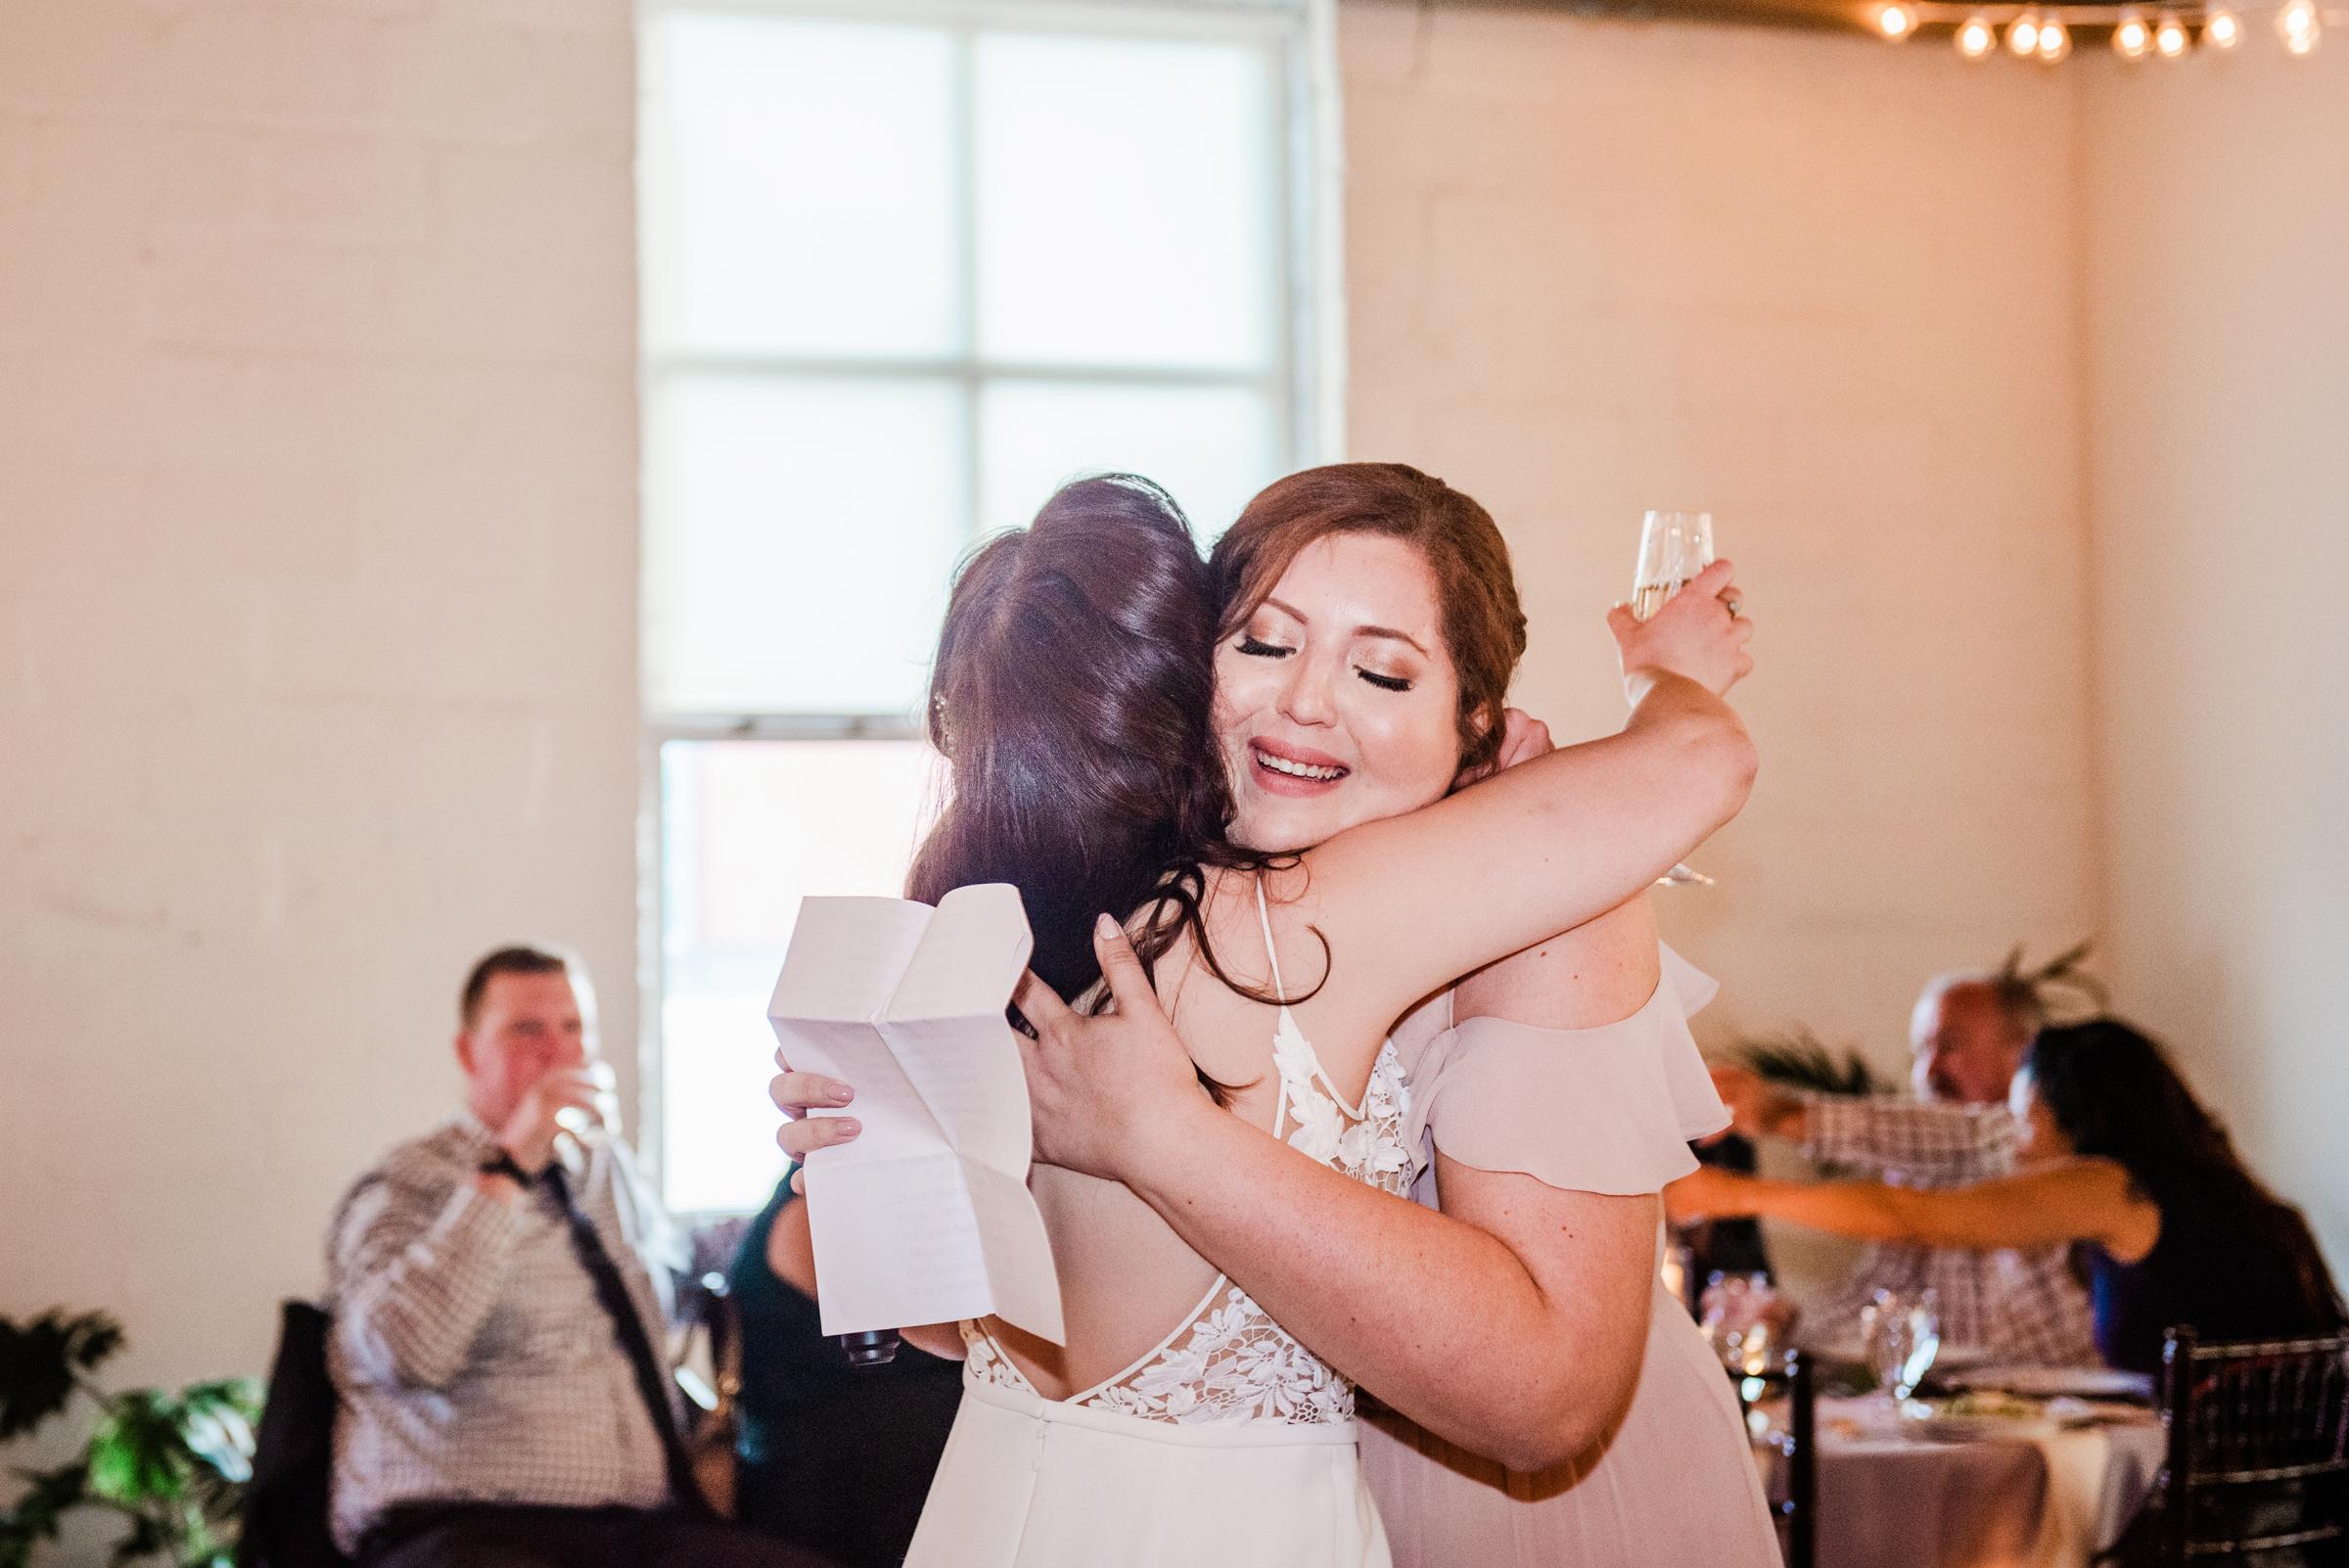 The_Arbor_LoftRochester_Wedding_JILL_STUDIO_Rochester_NY_Photographer_190642.jpg